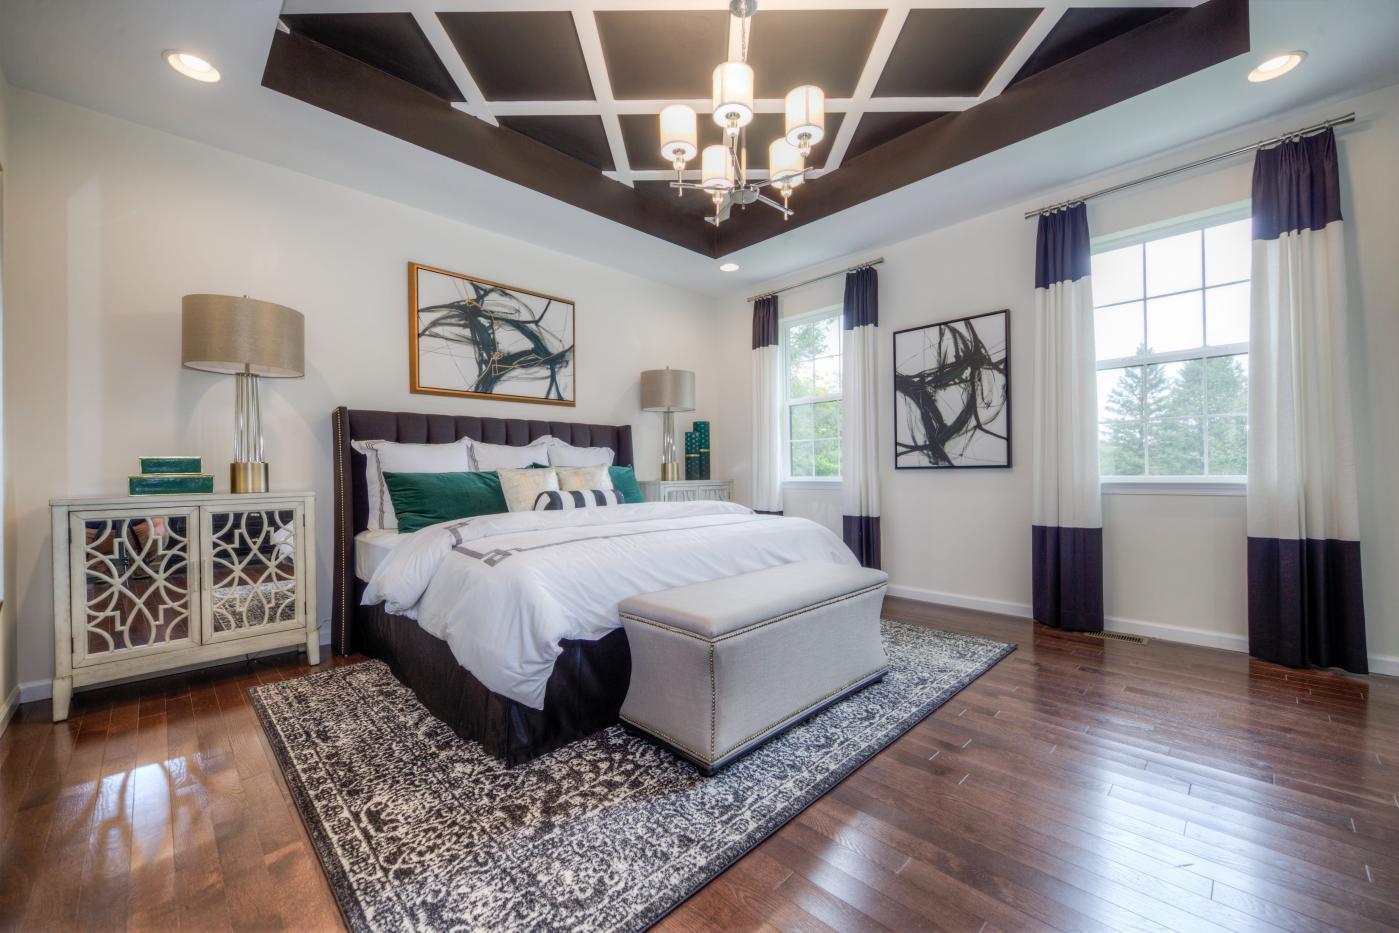 Bedroom featured in the Mayfair II By Kay Builders in Allentown-Bethlehem, PA